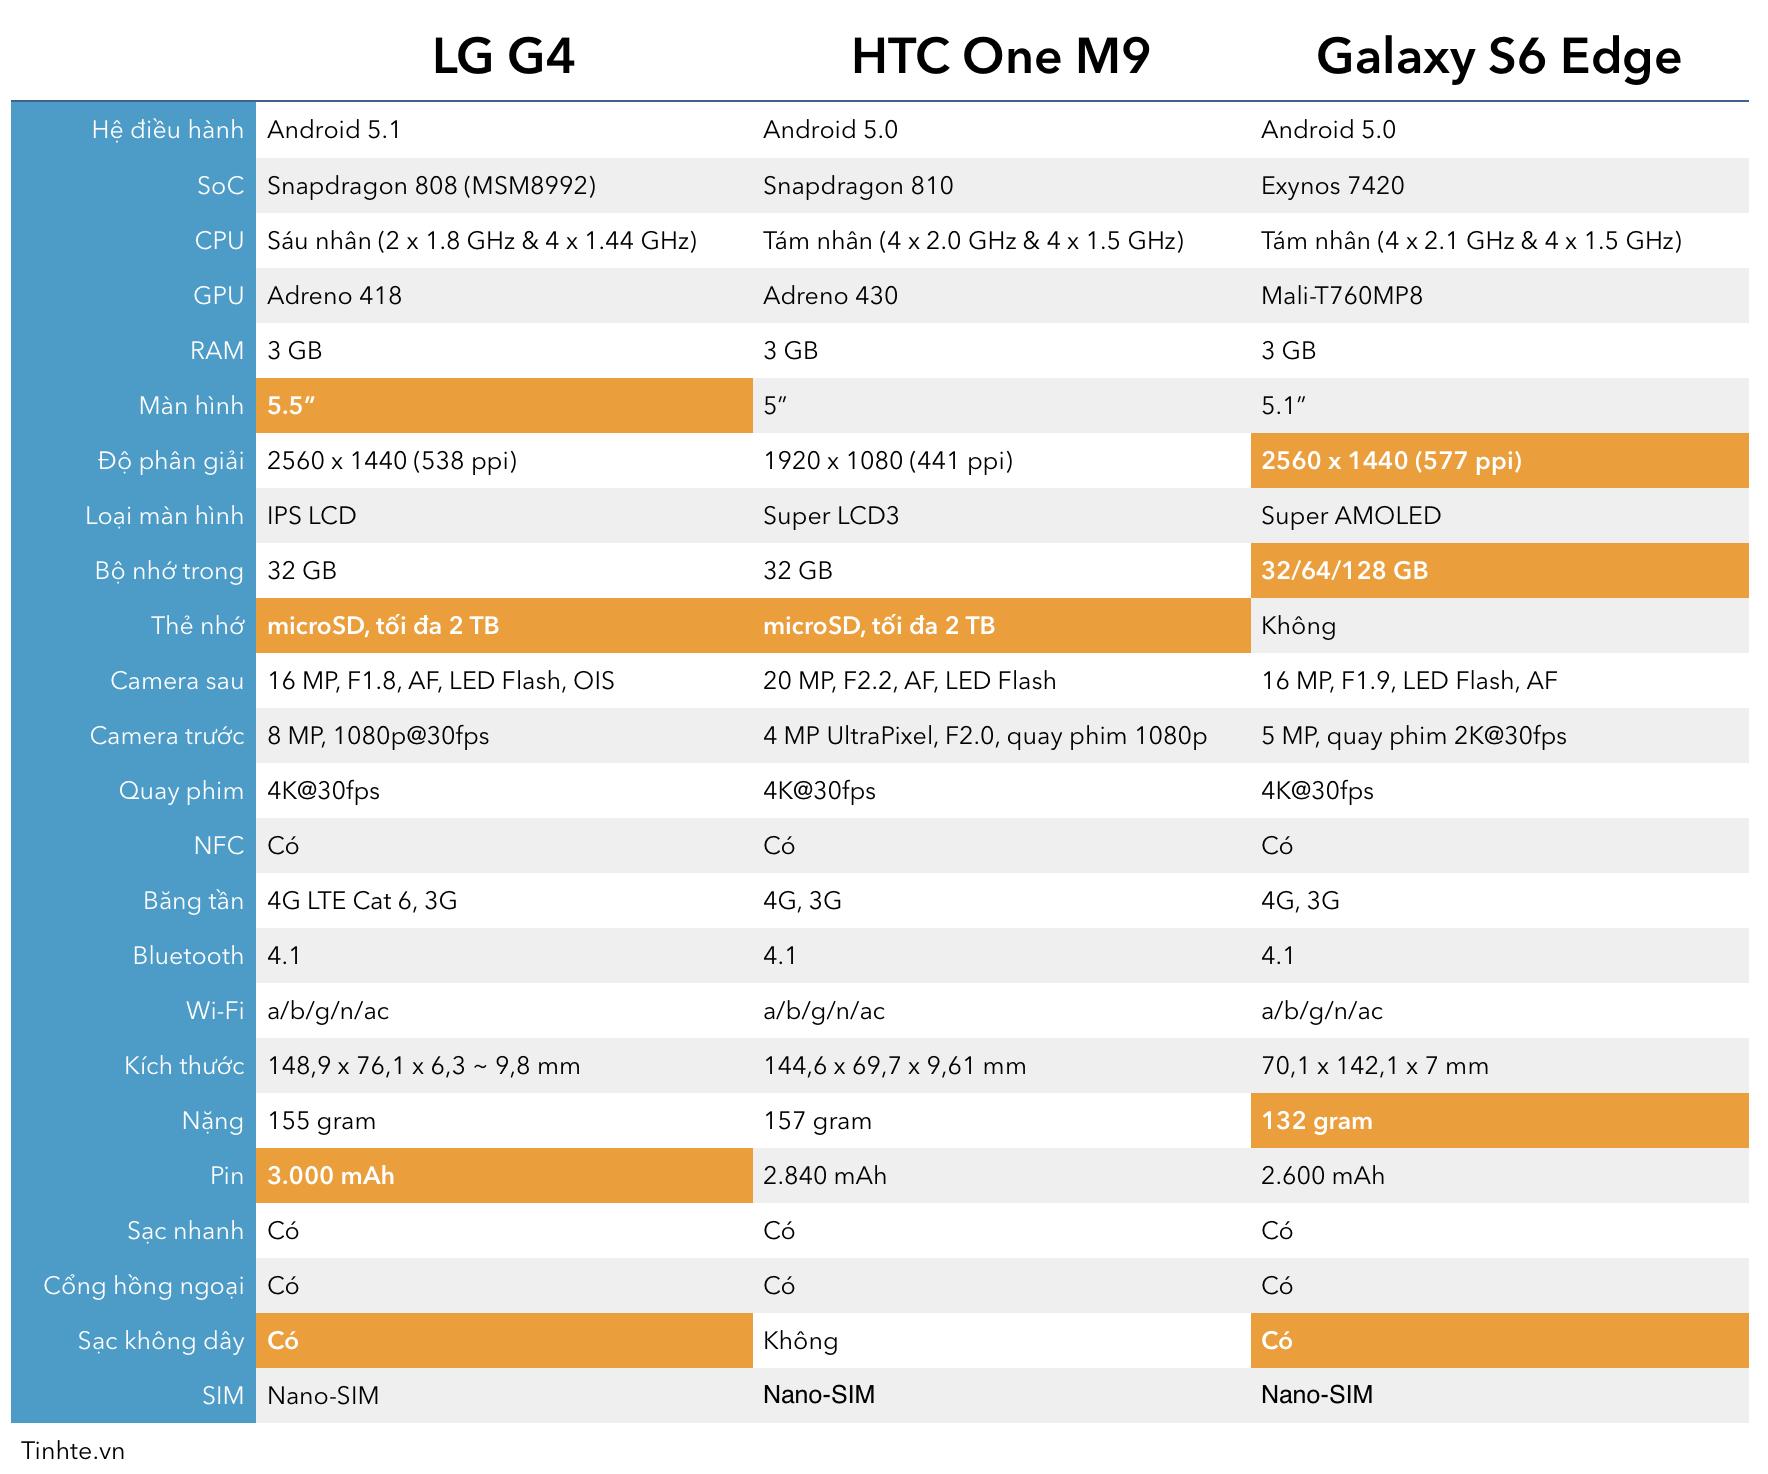 LG-G4-Galaxy-s6-HTC-One-M9.png